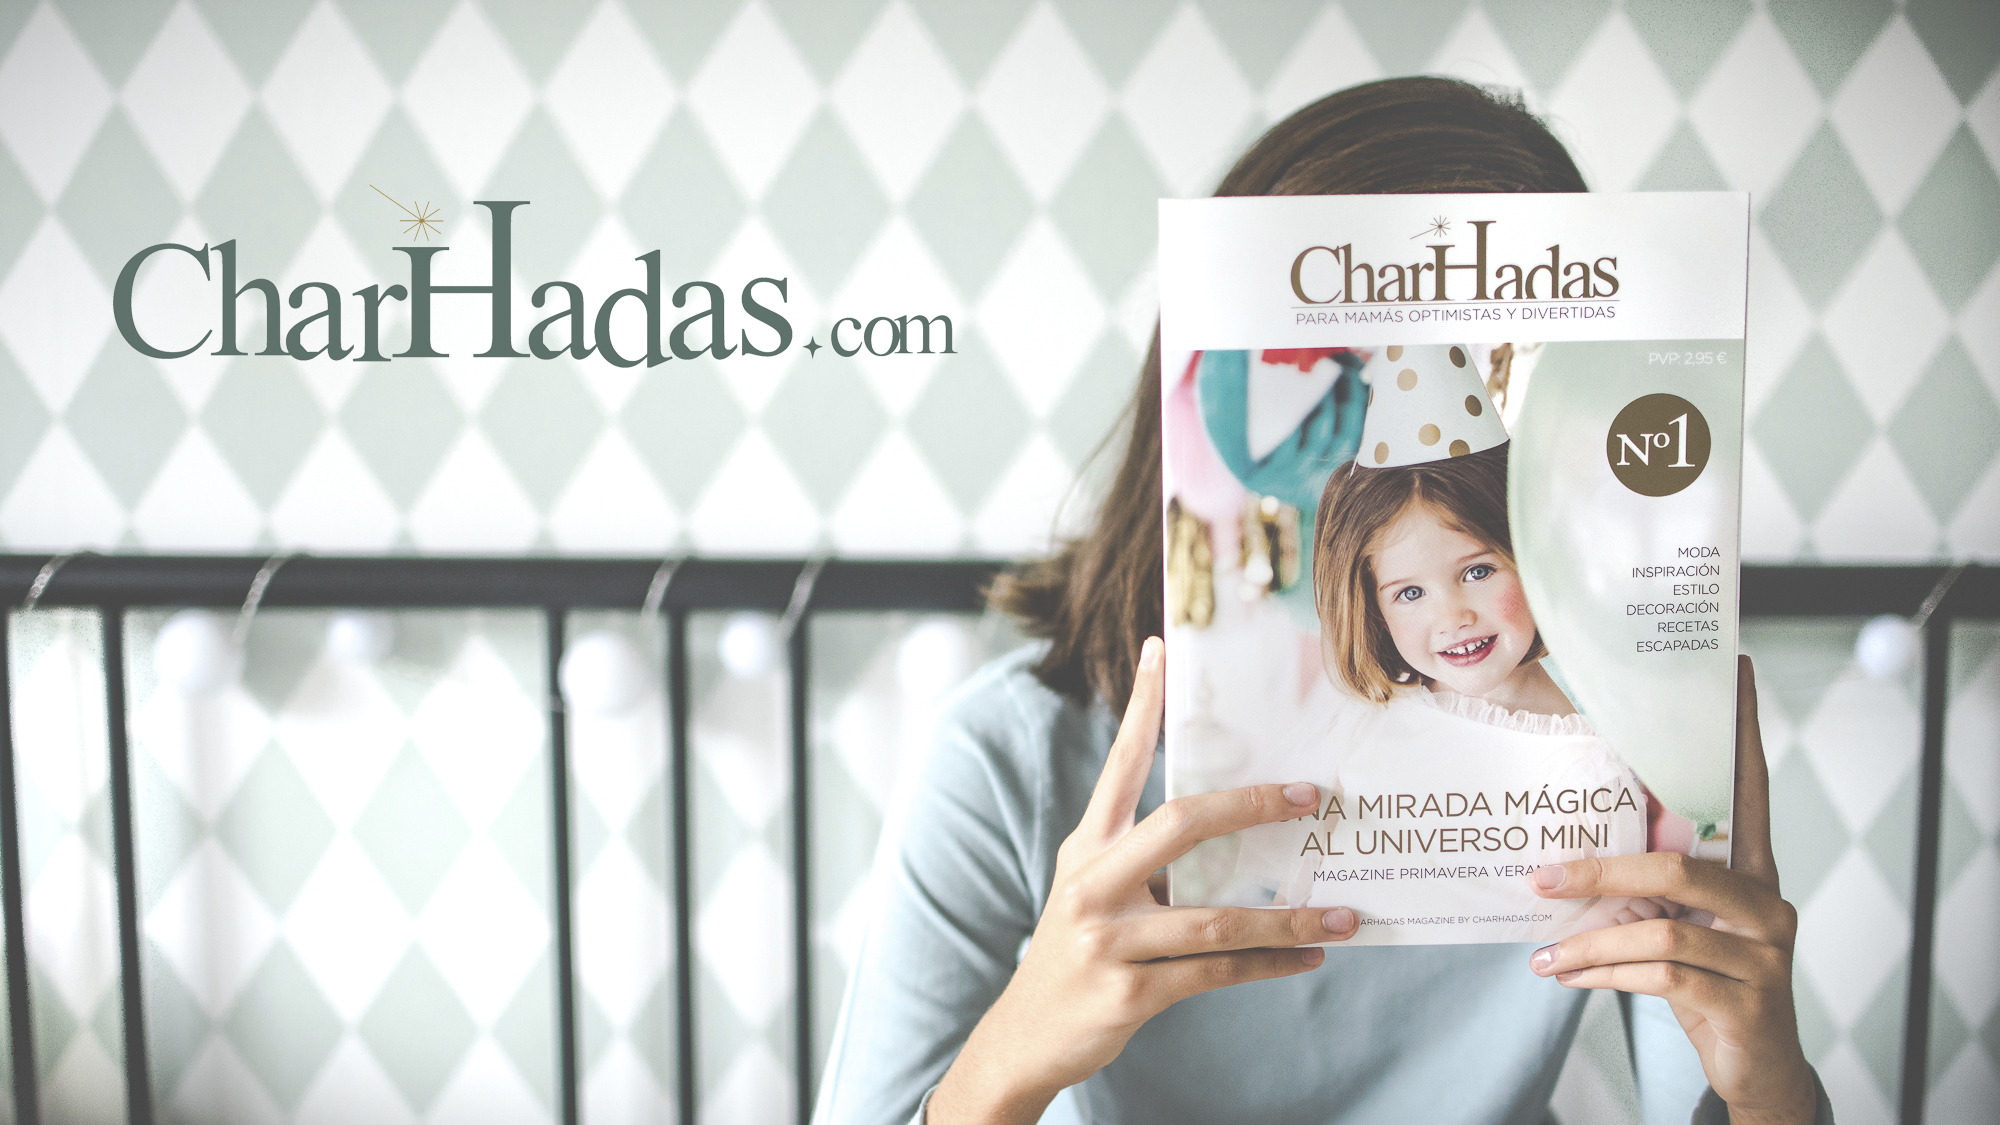 Charhadas-2 1